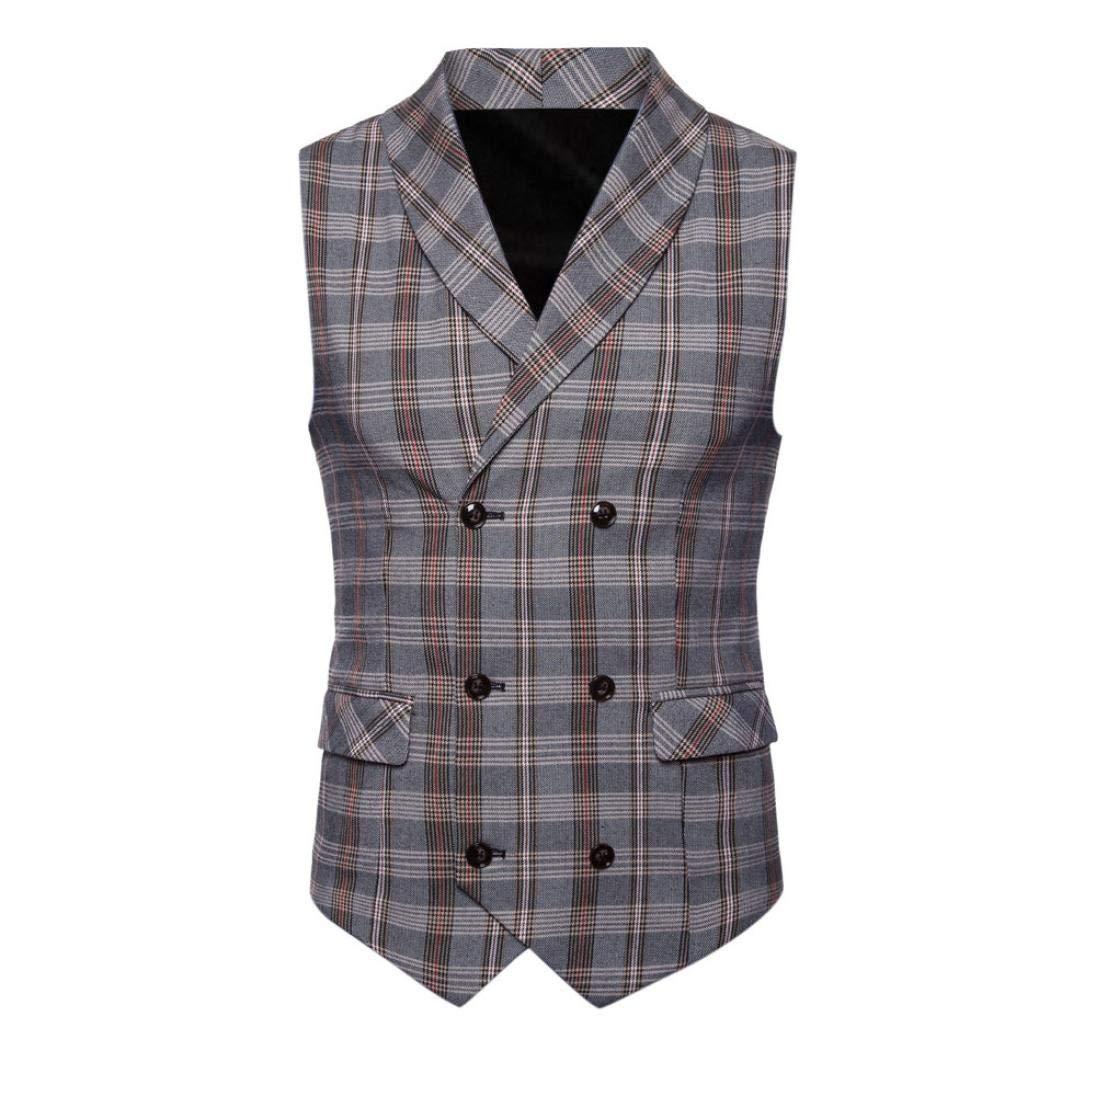 iLXHD Casual Men Plaid Printed Sleeveless Jacket Coat Suit Vest Blouse